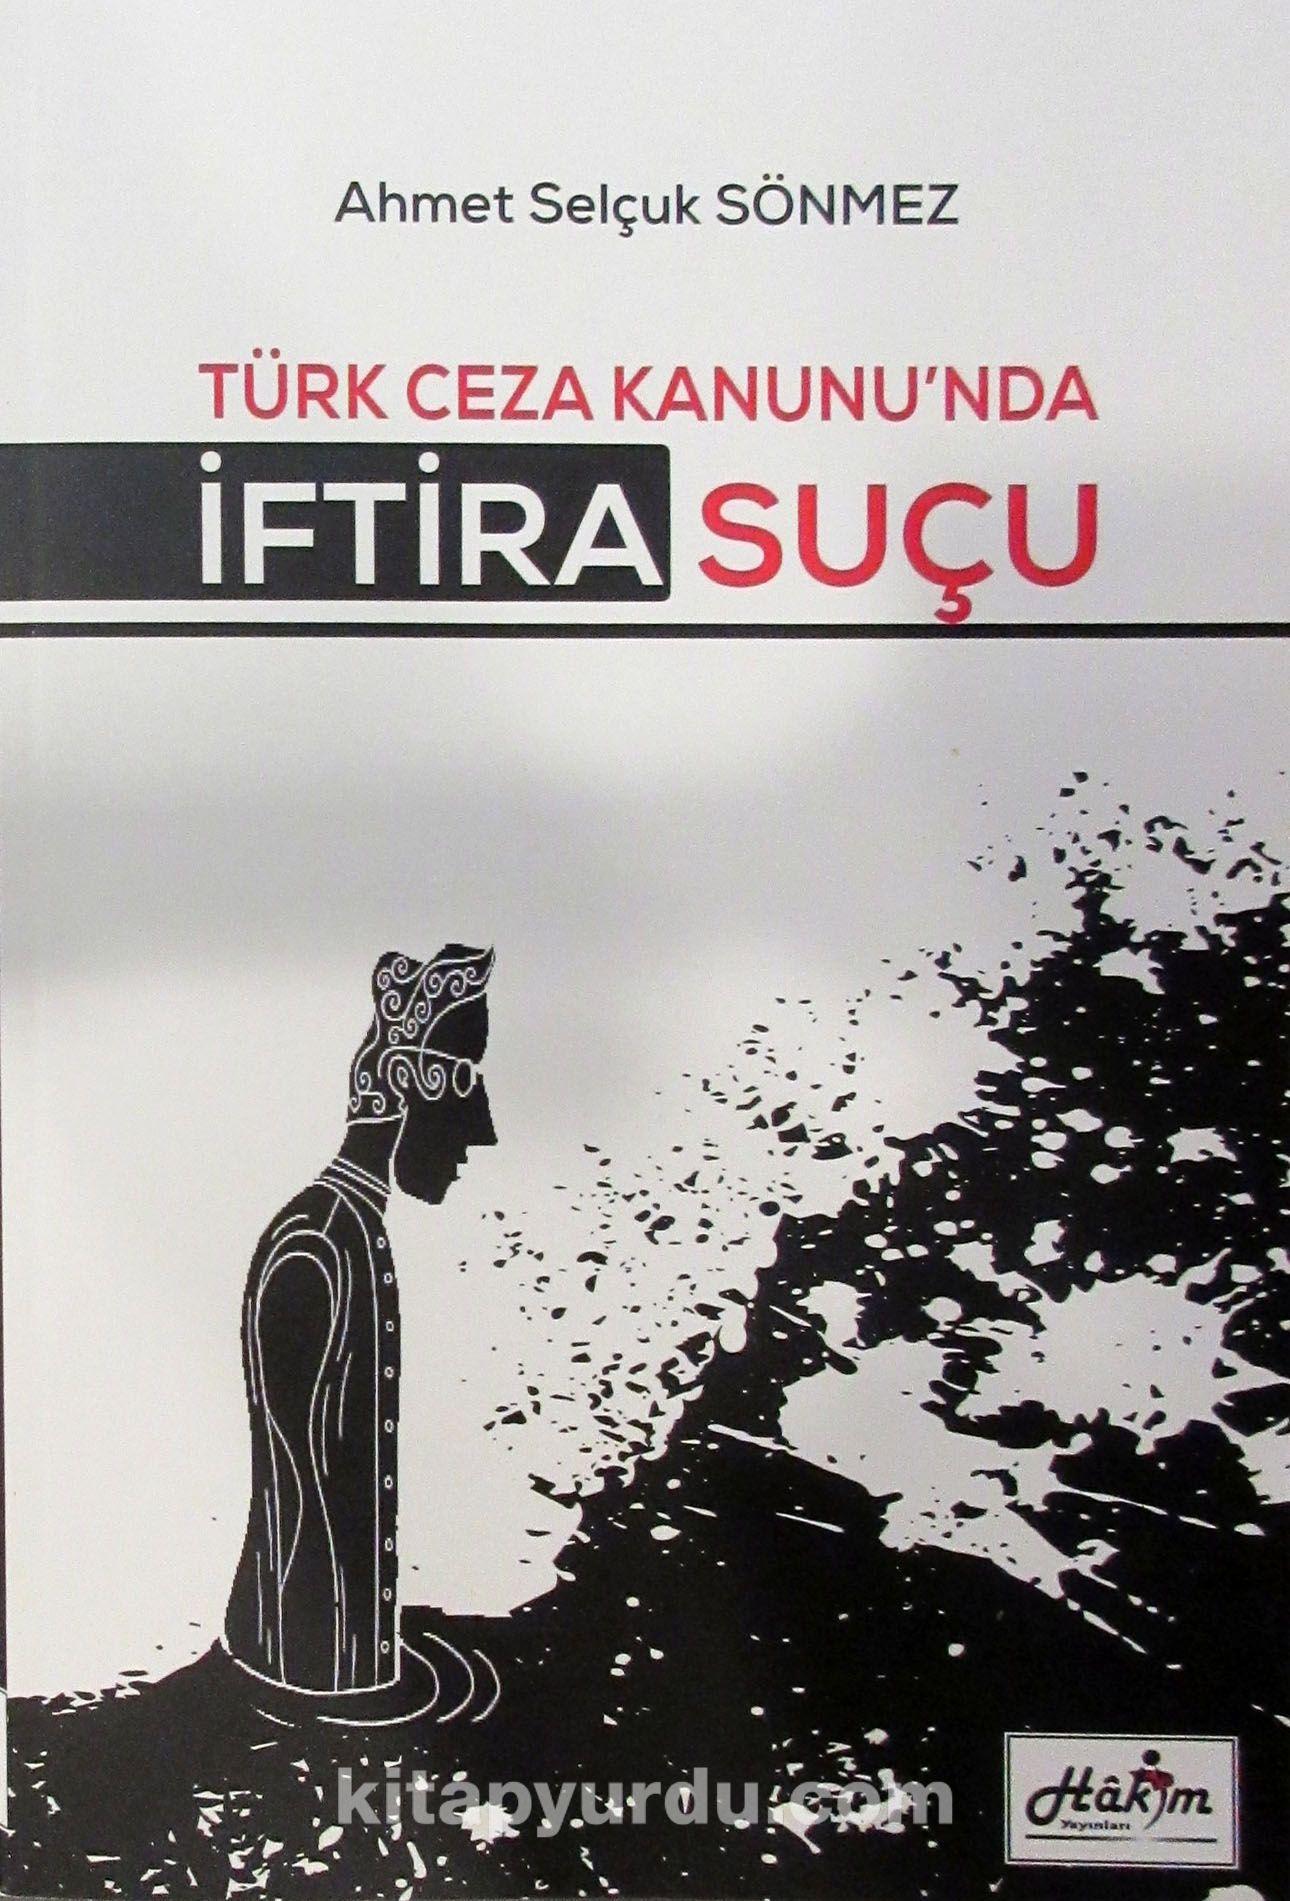 Türk Ceza Kanunu nda İftira Suçu